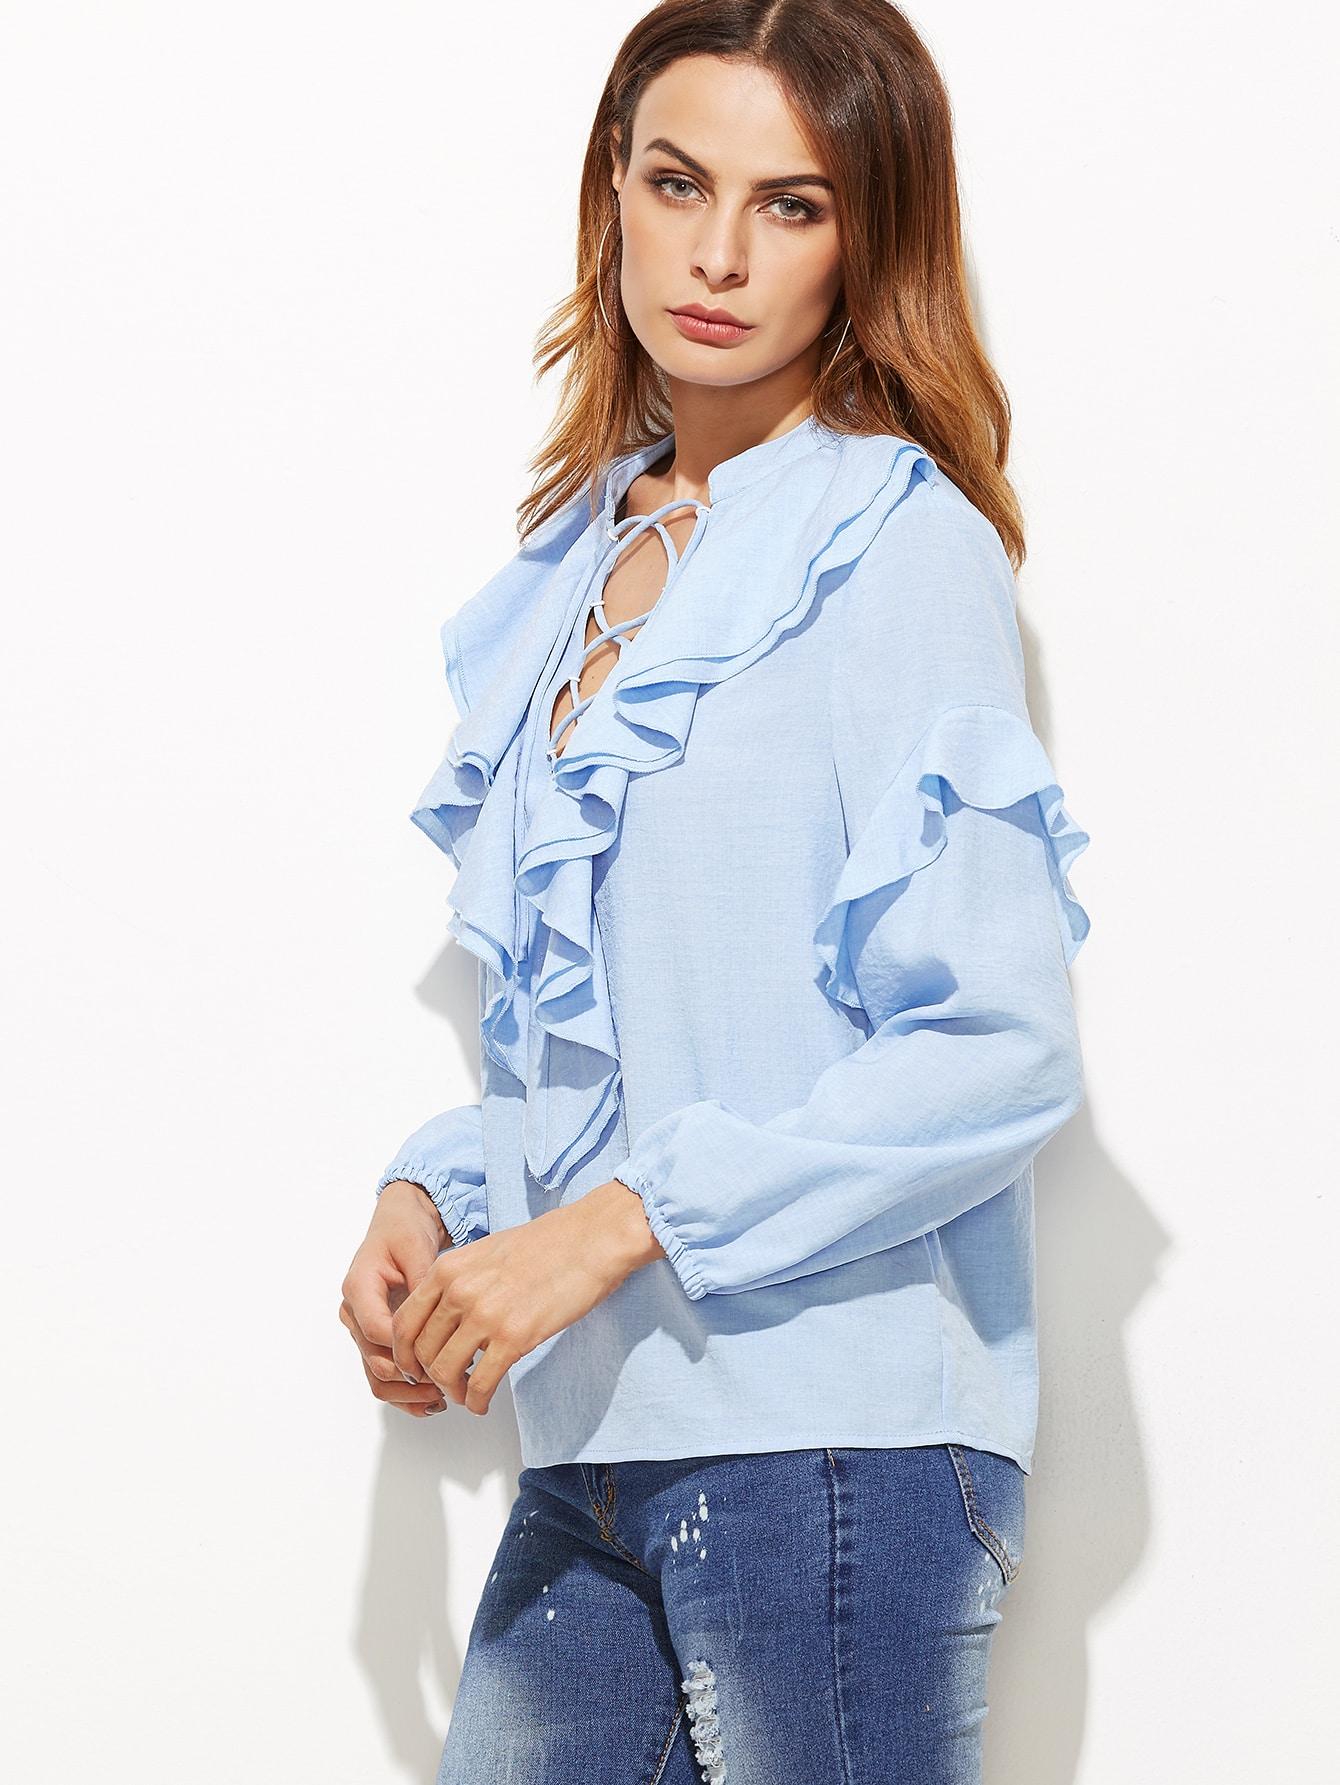 blouse161031704_2